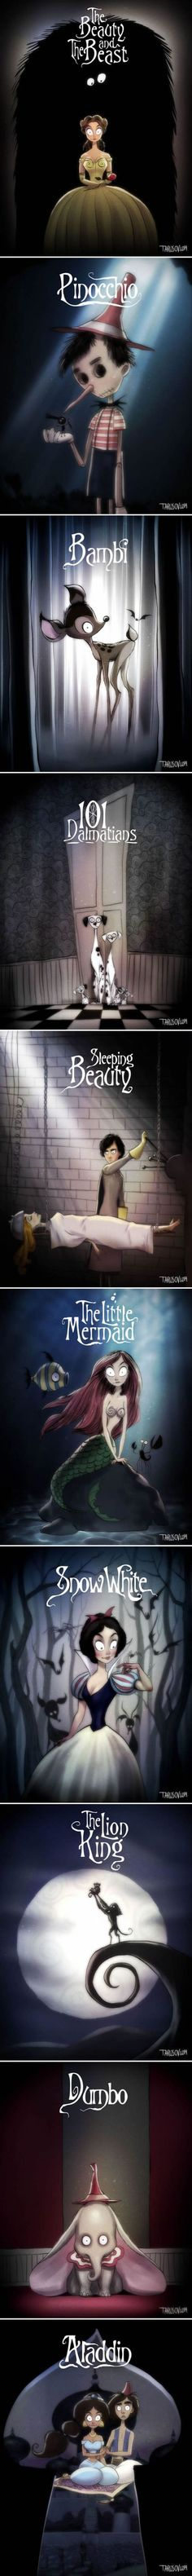 If Tim Burton Directed Disney Movies (By Andrew Tarusov)